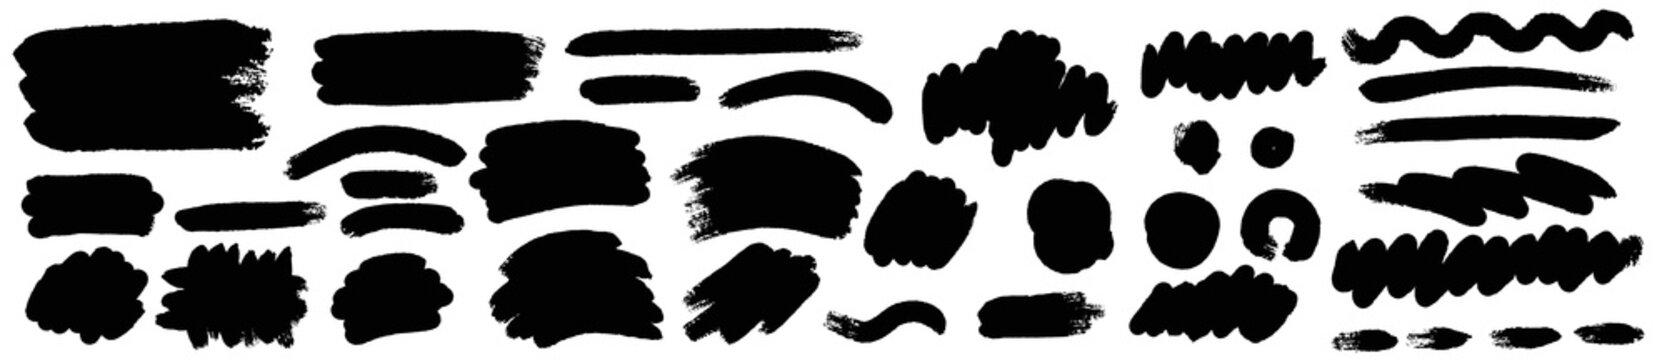 Brush paint vector set